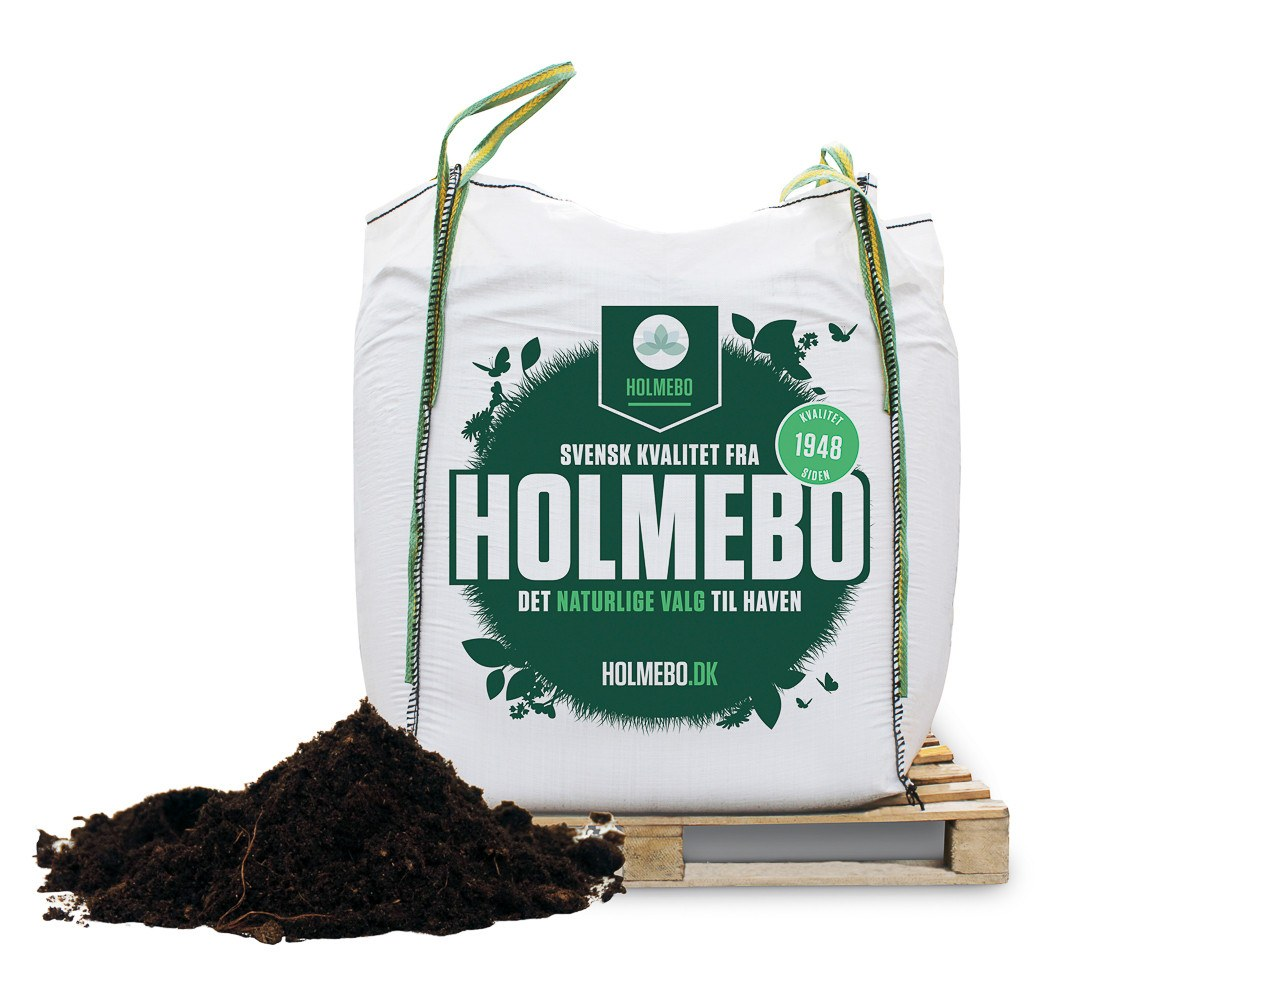 Holmebo Gartnermuld - Bigbag á 1000 liter